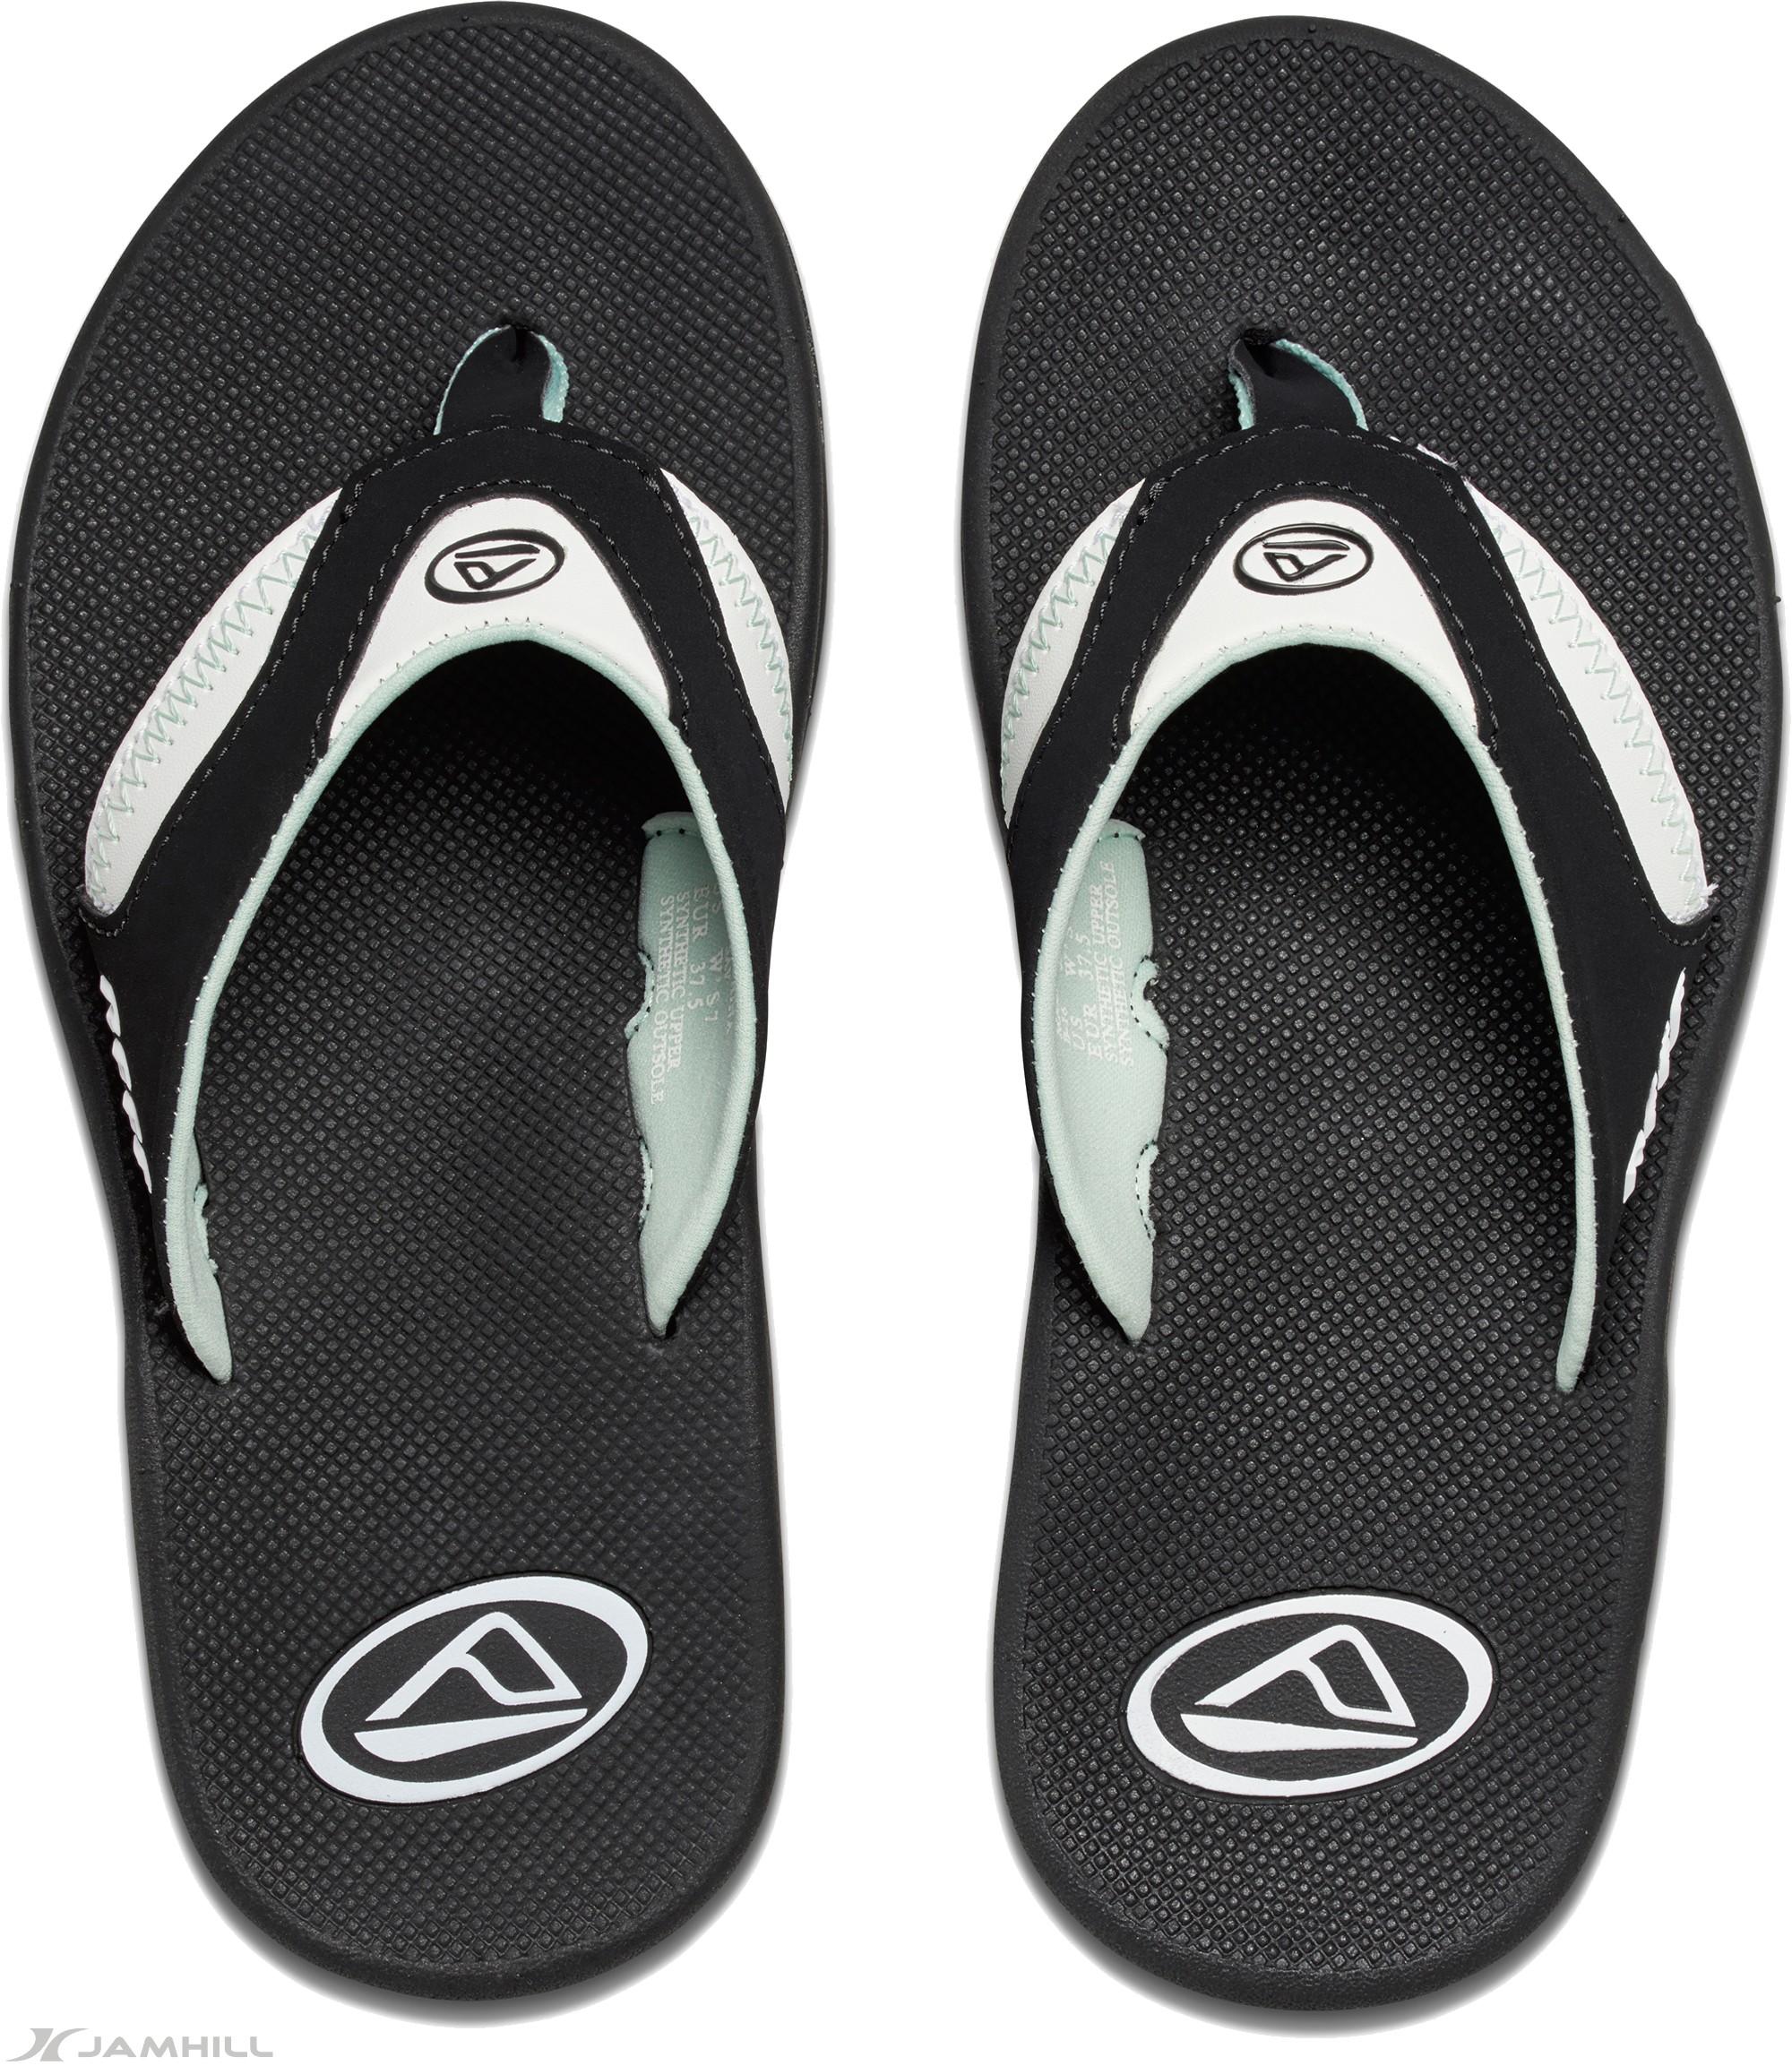 Black sandals ebay uk - Picture 3 Of 4